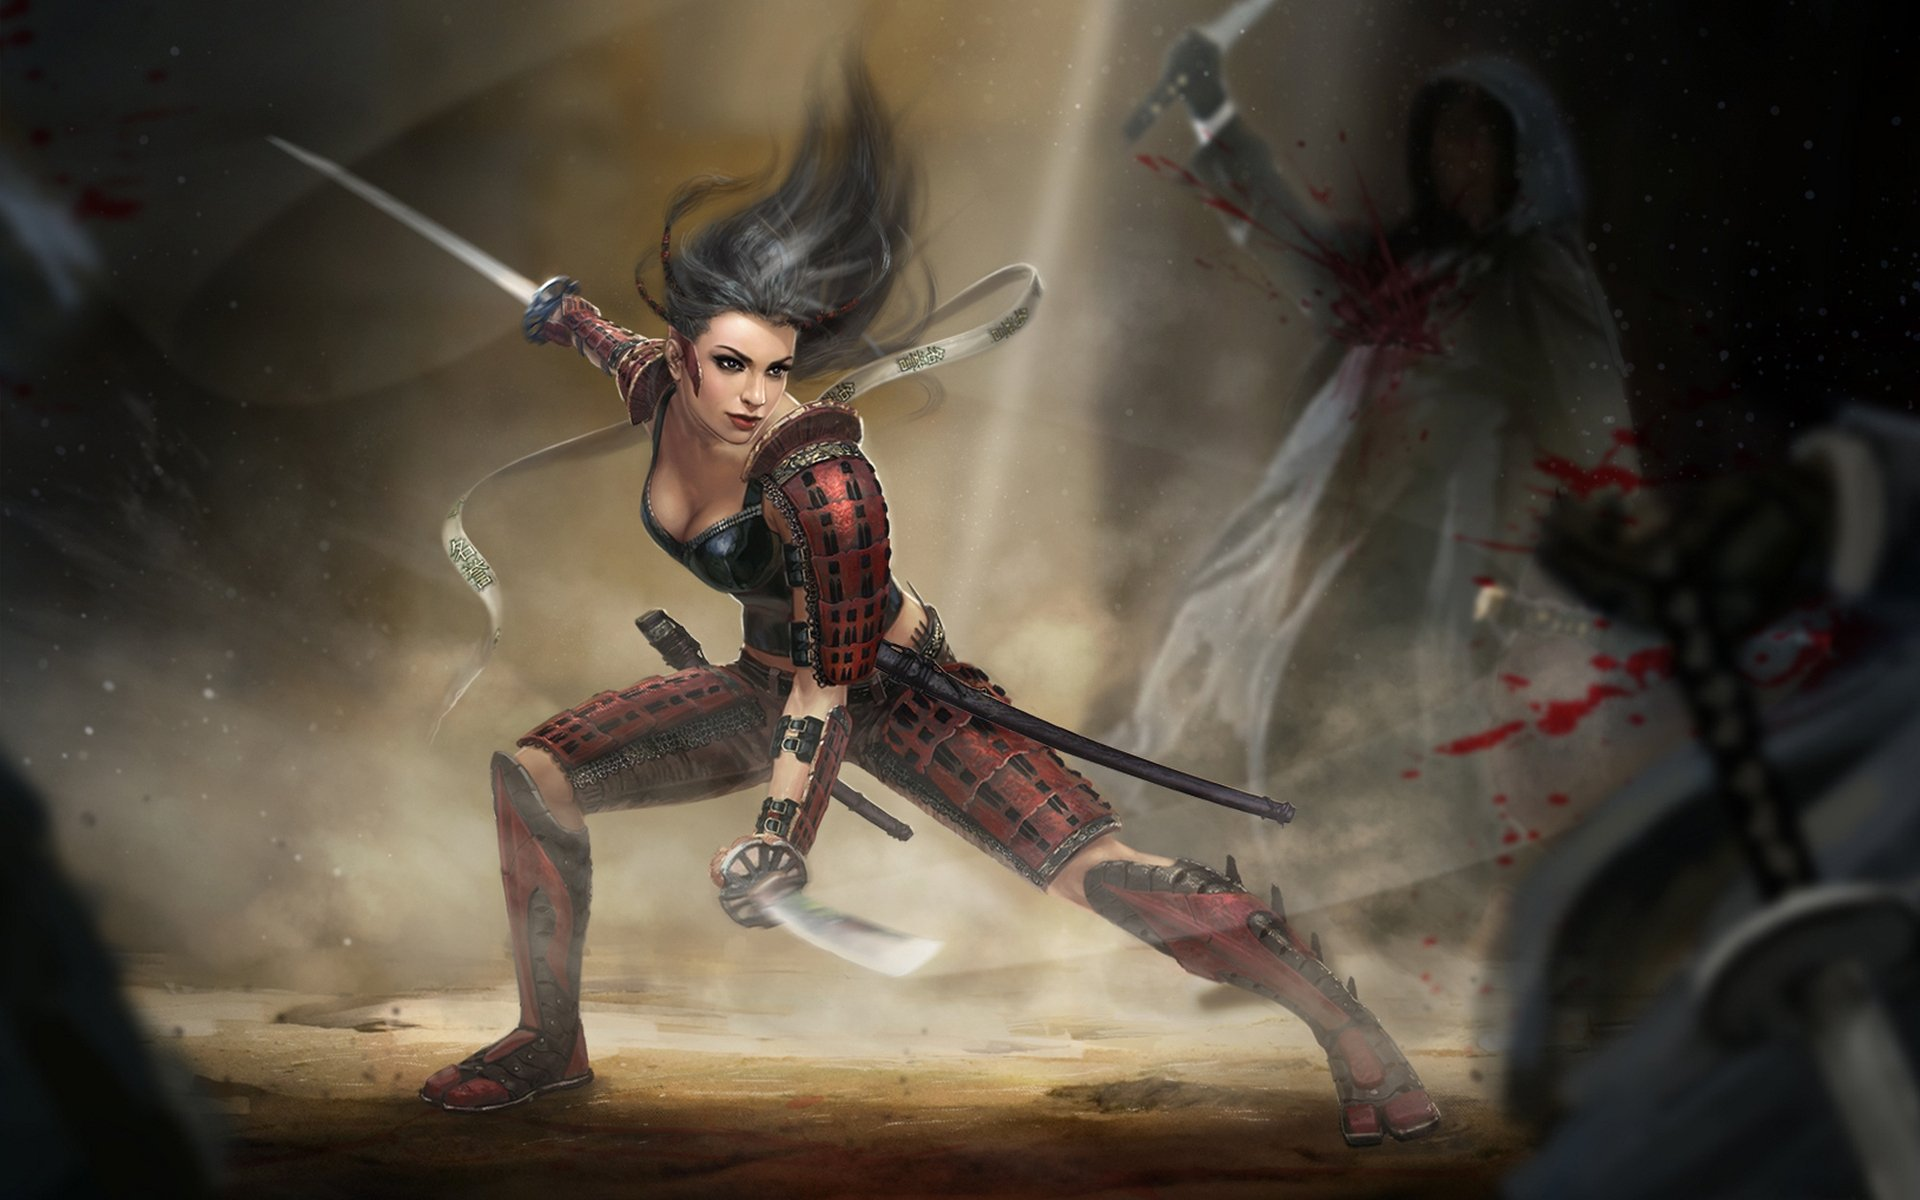 Fantasy - Samurai  Armor Woman Warrior Blood Sword Fantasy Girl Fight Wallpaper